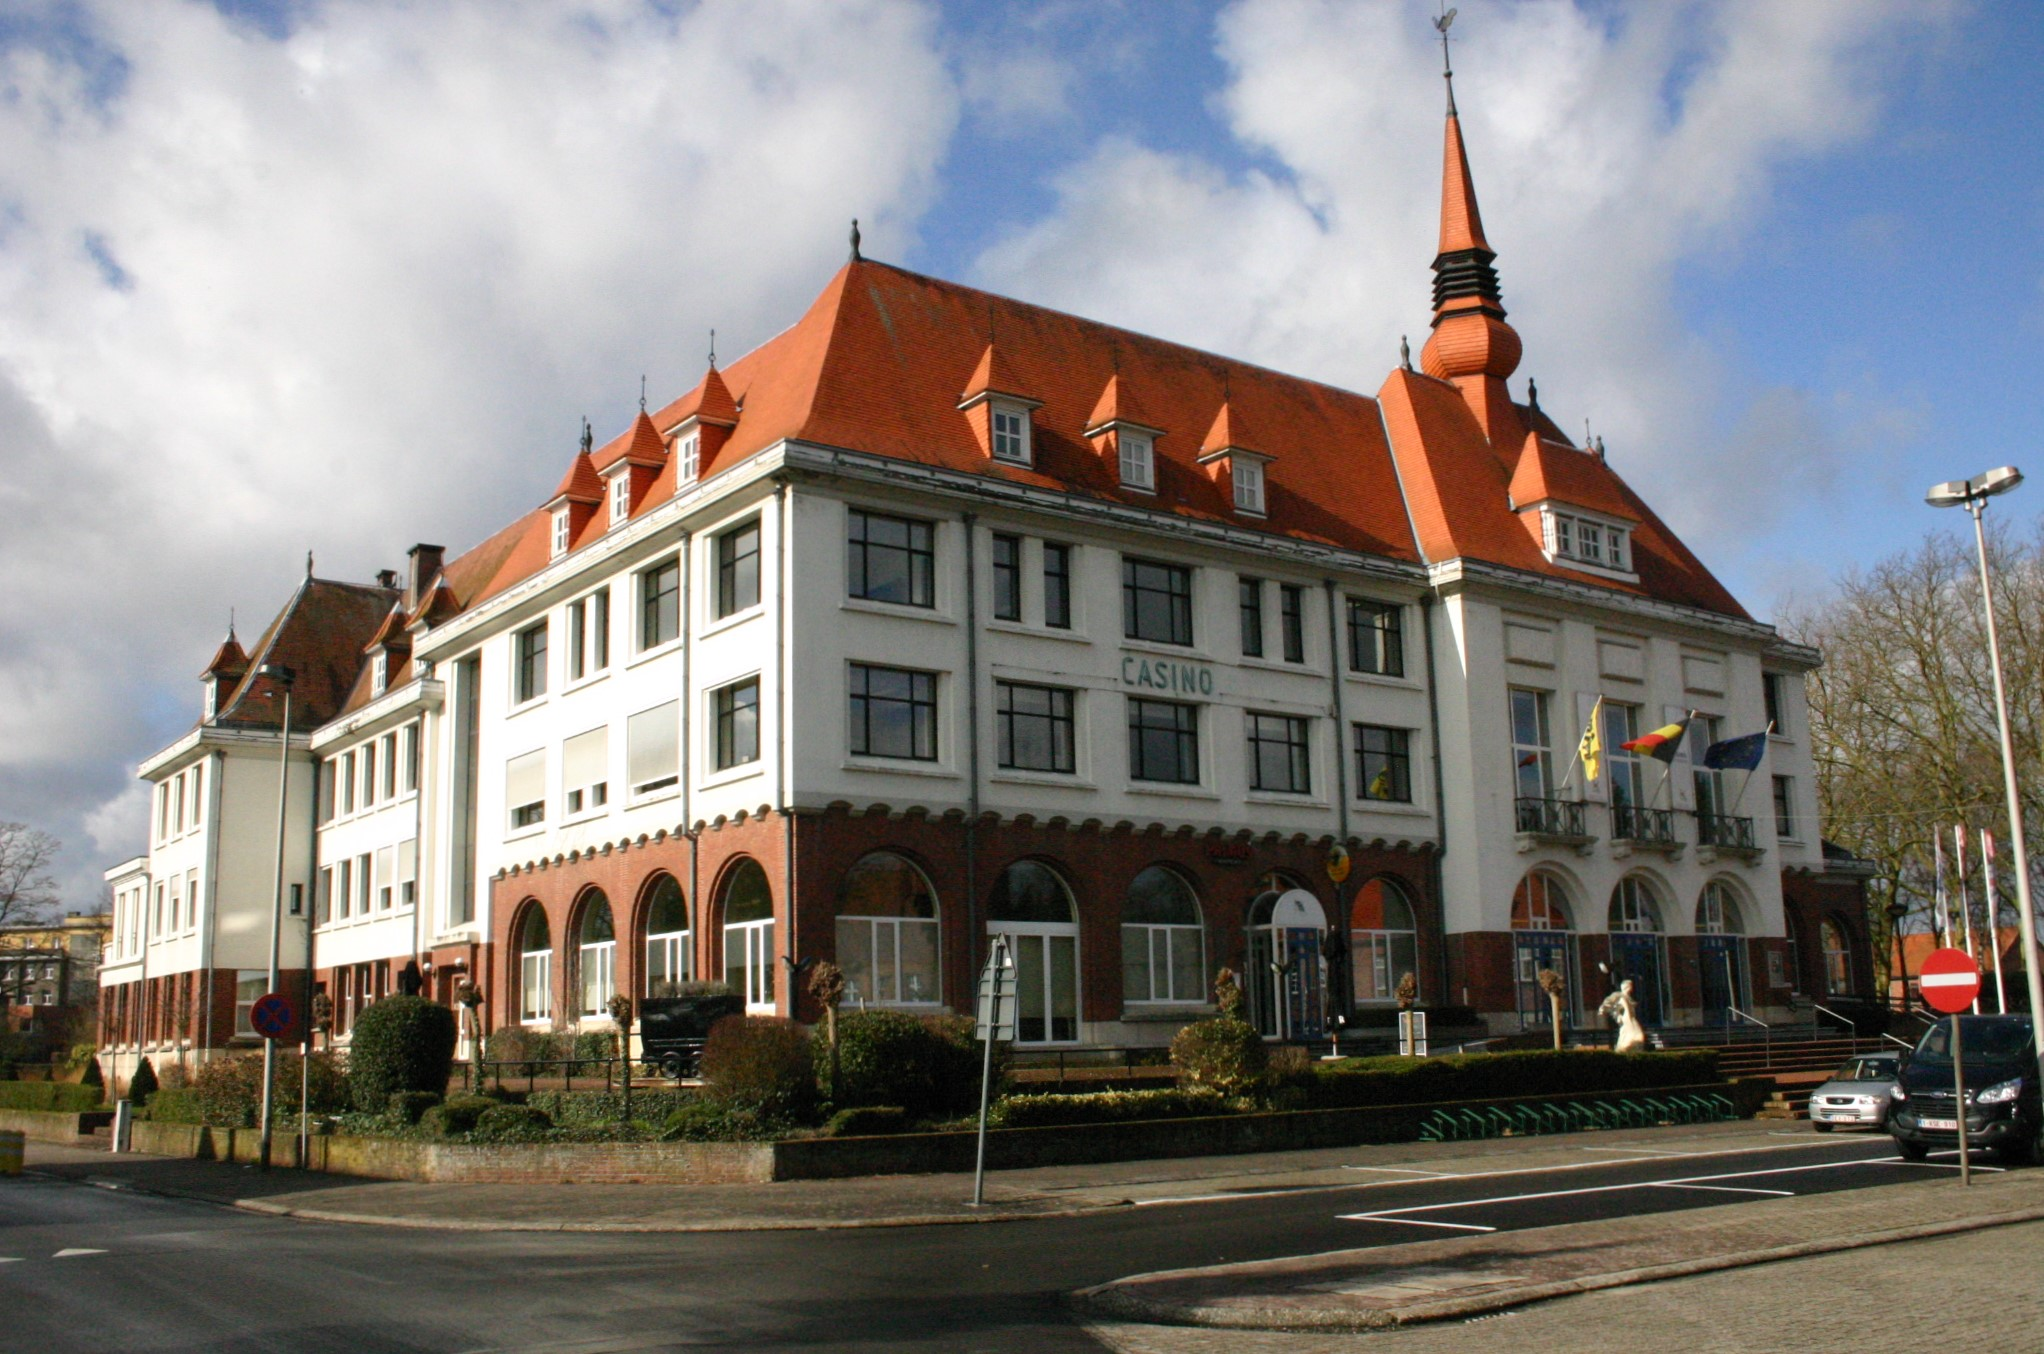 Casino Bofingen